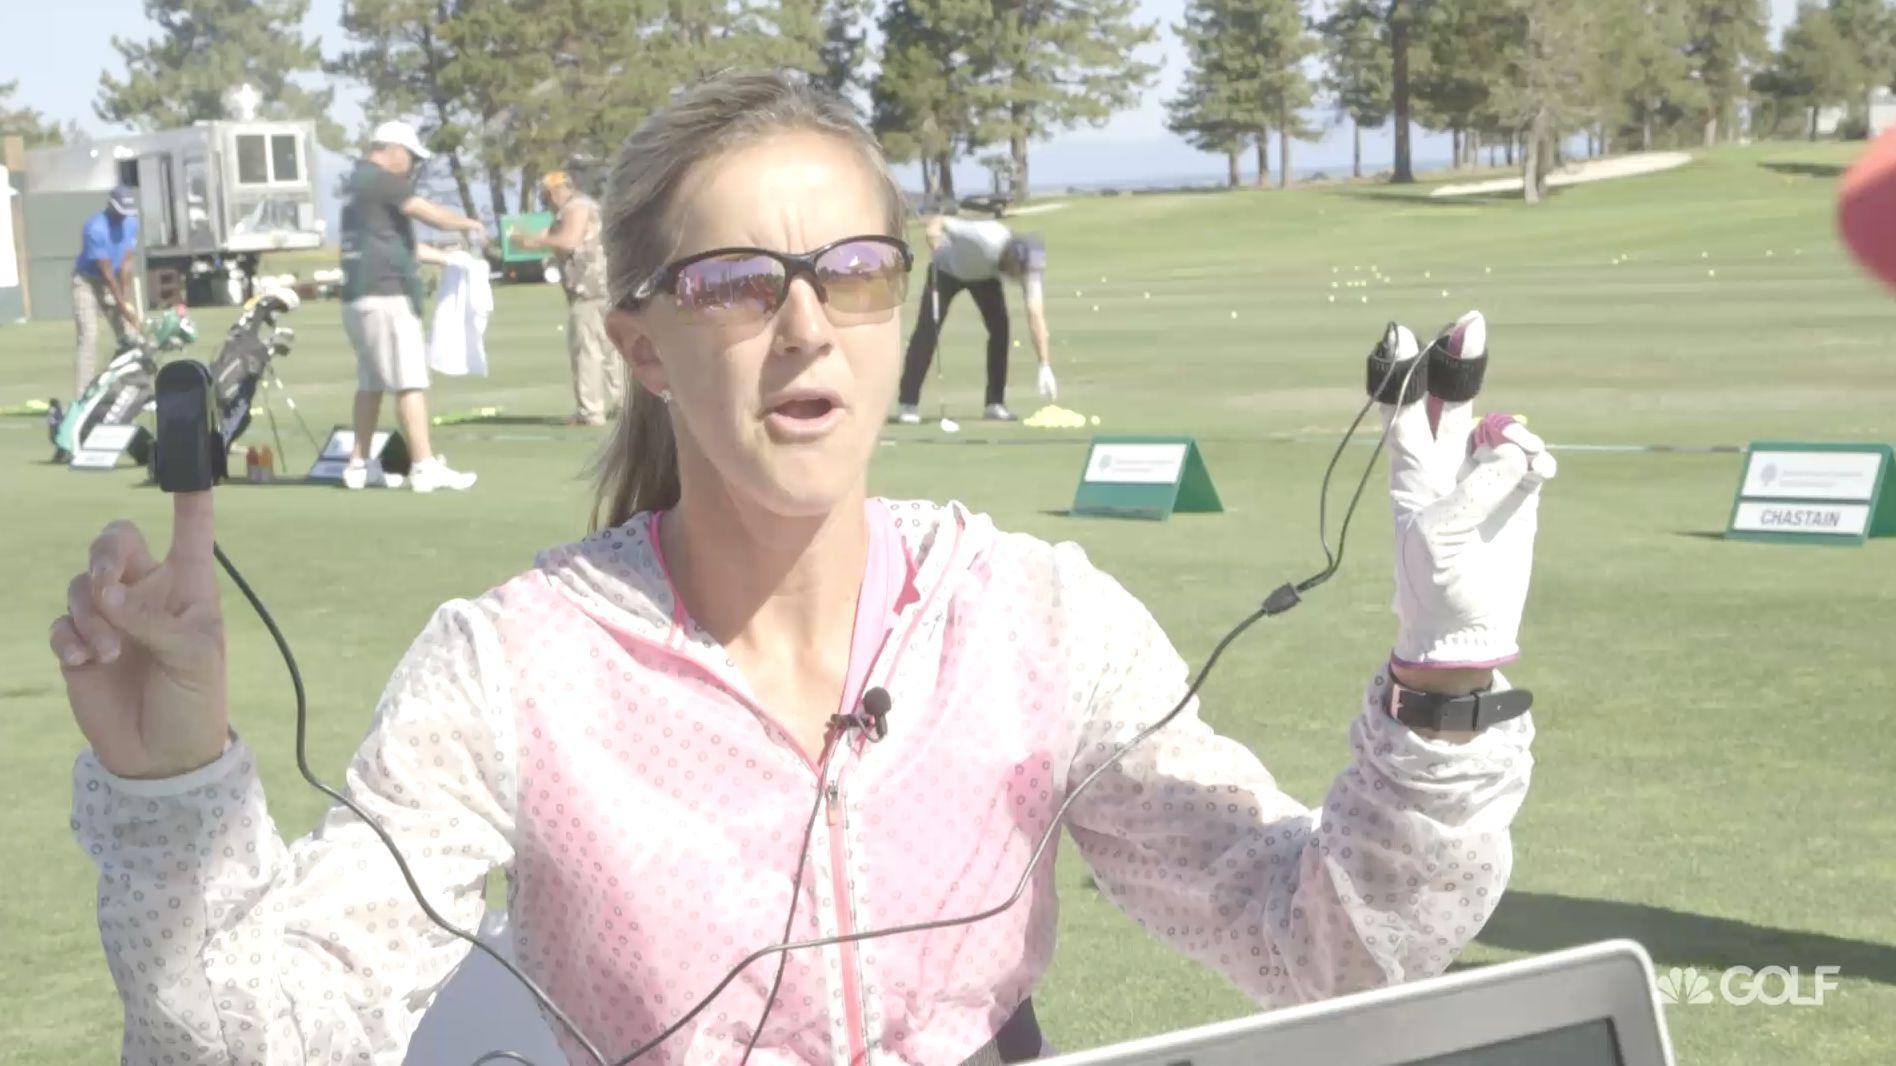 http://golfchannel-a.akamaihd.net/ramp/579/975/acc-lie-detector-brandi-chastain.jpg